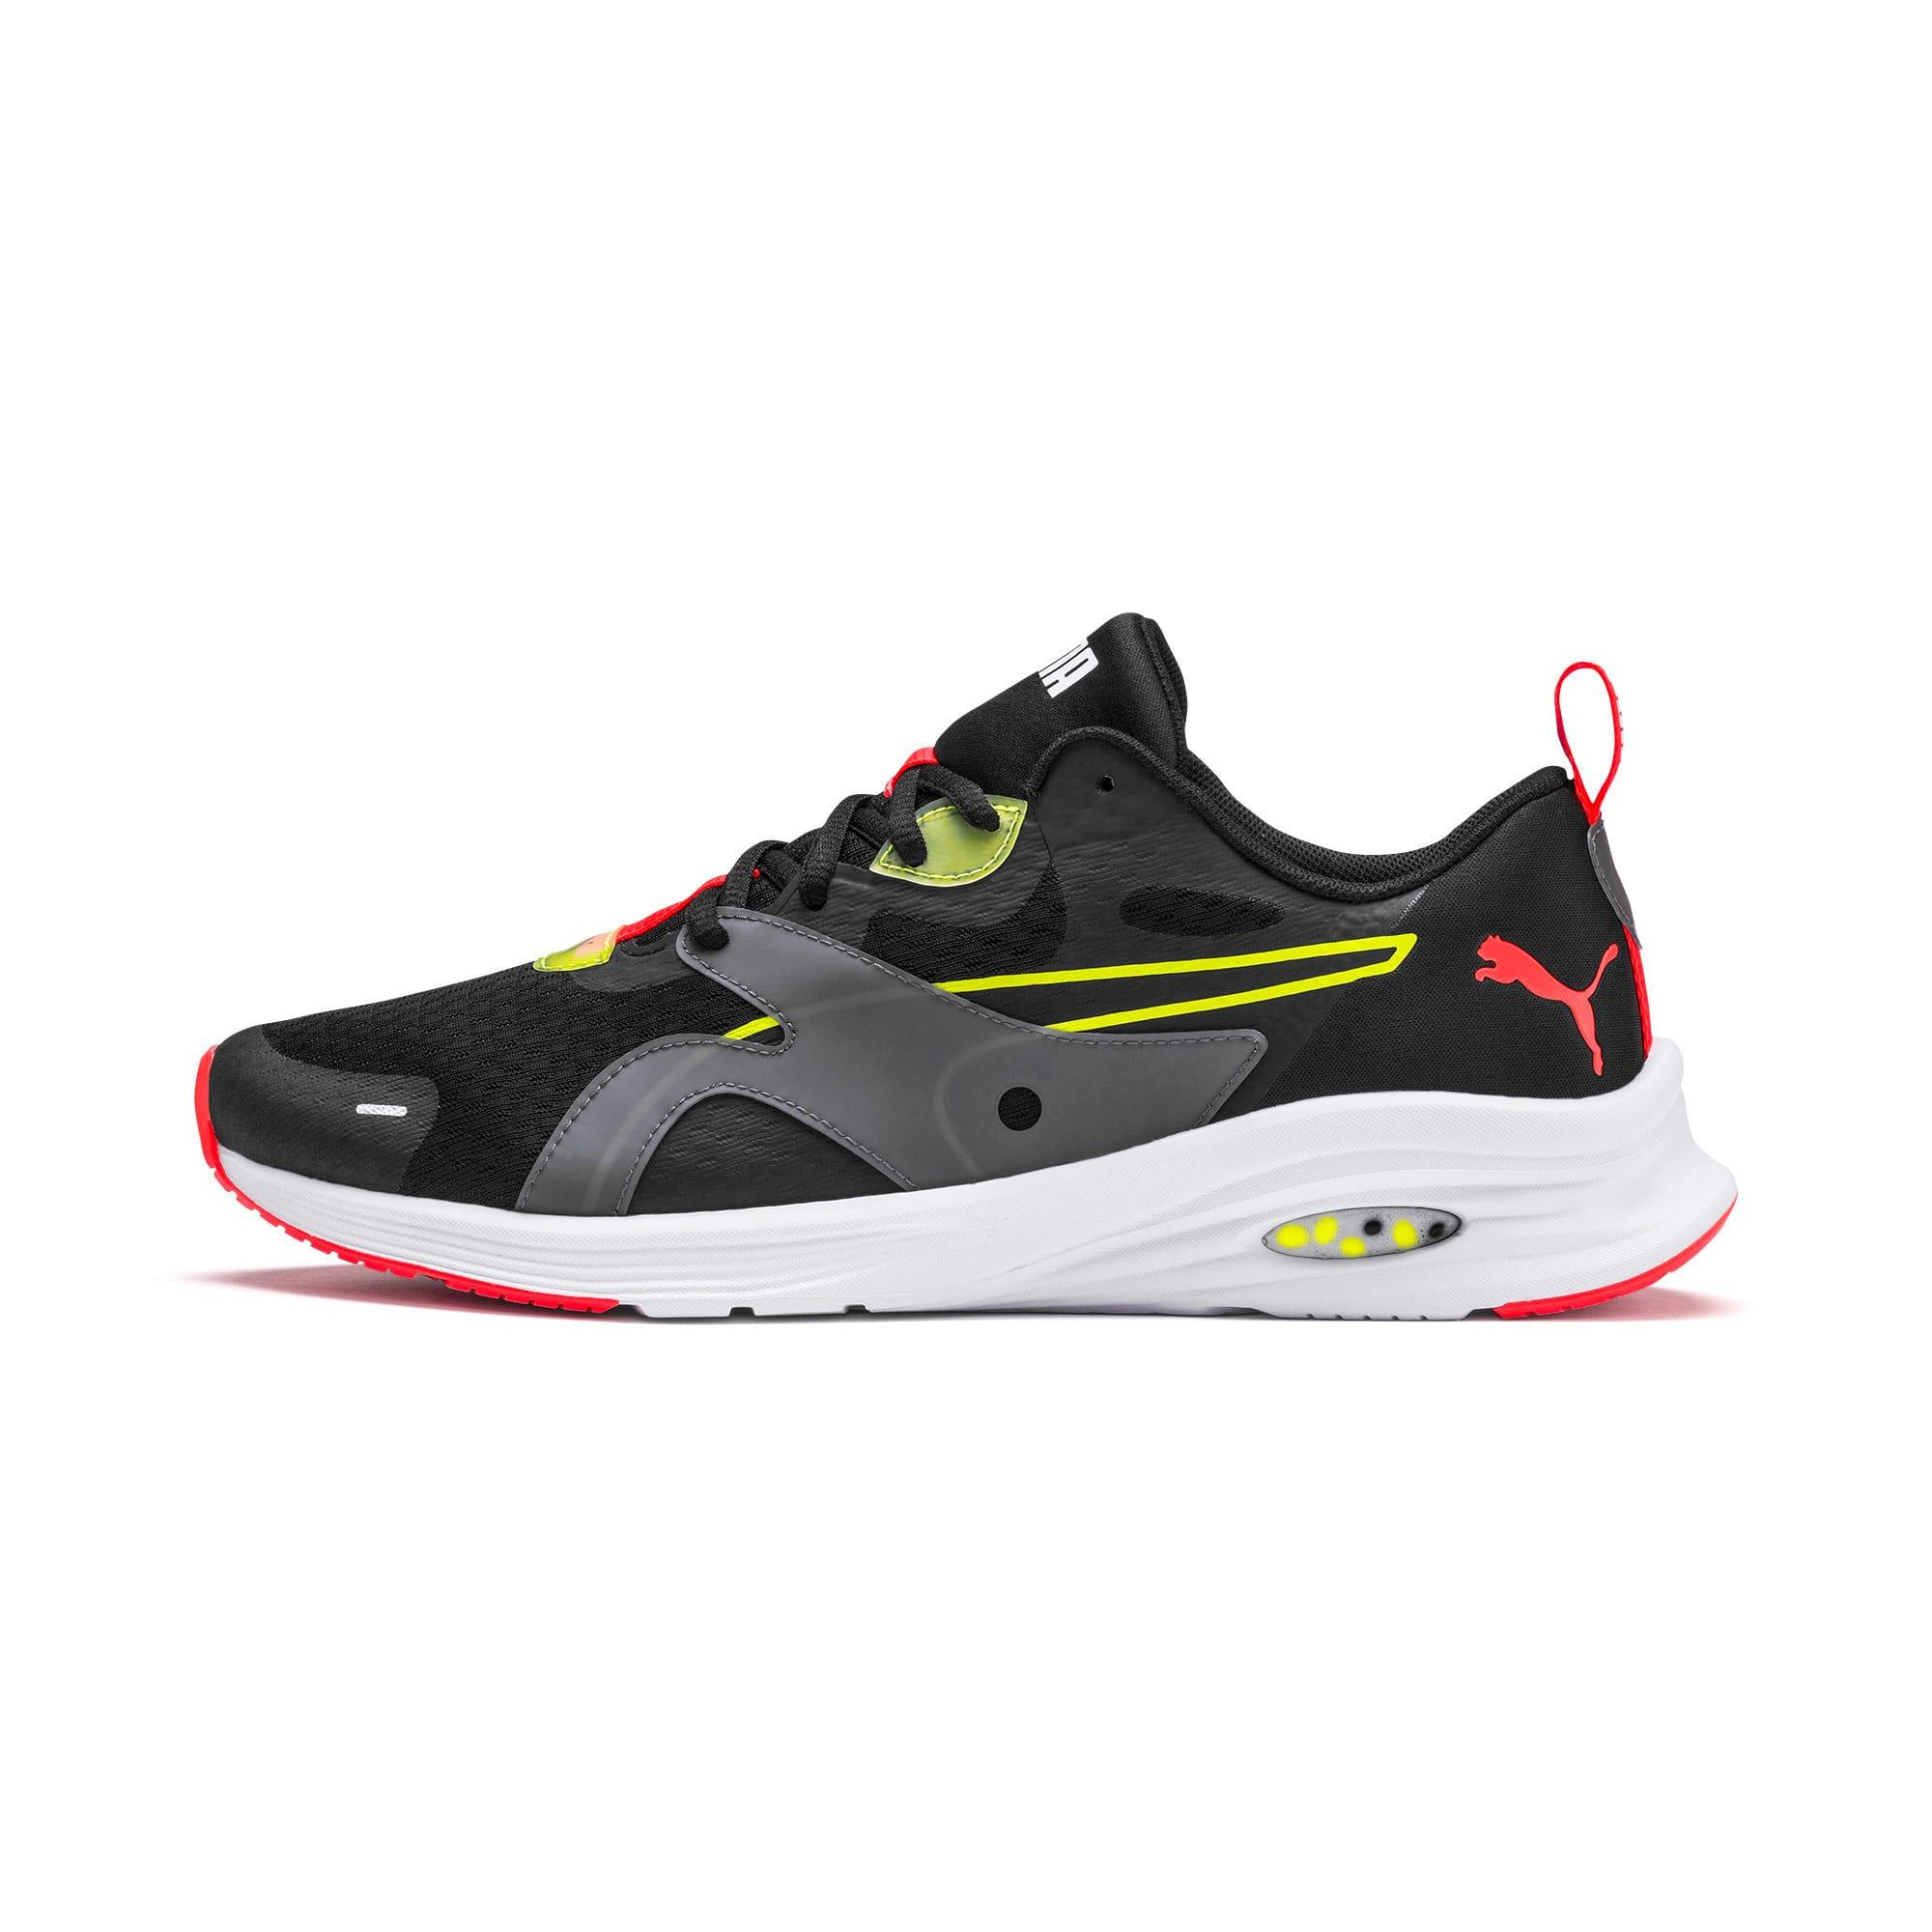 Thumbnail 1 of HYBRID Fuego Men's Running Shoes, Puma Black-Yellow Alert, medium